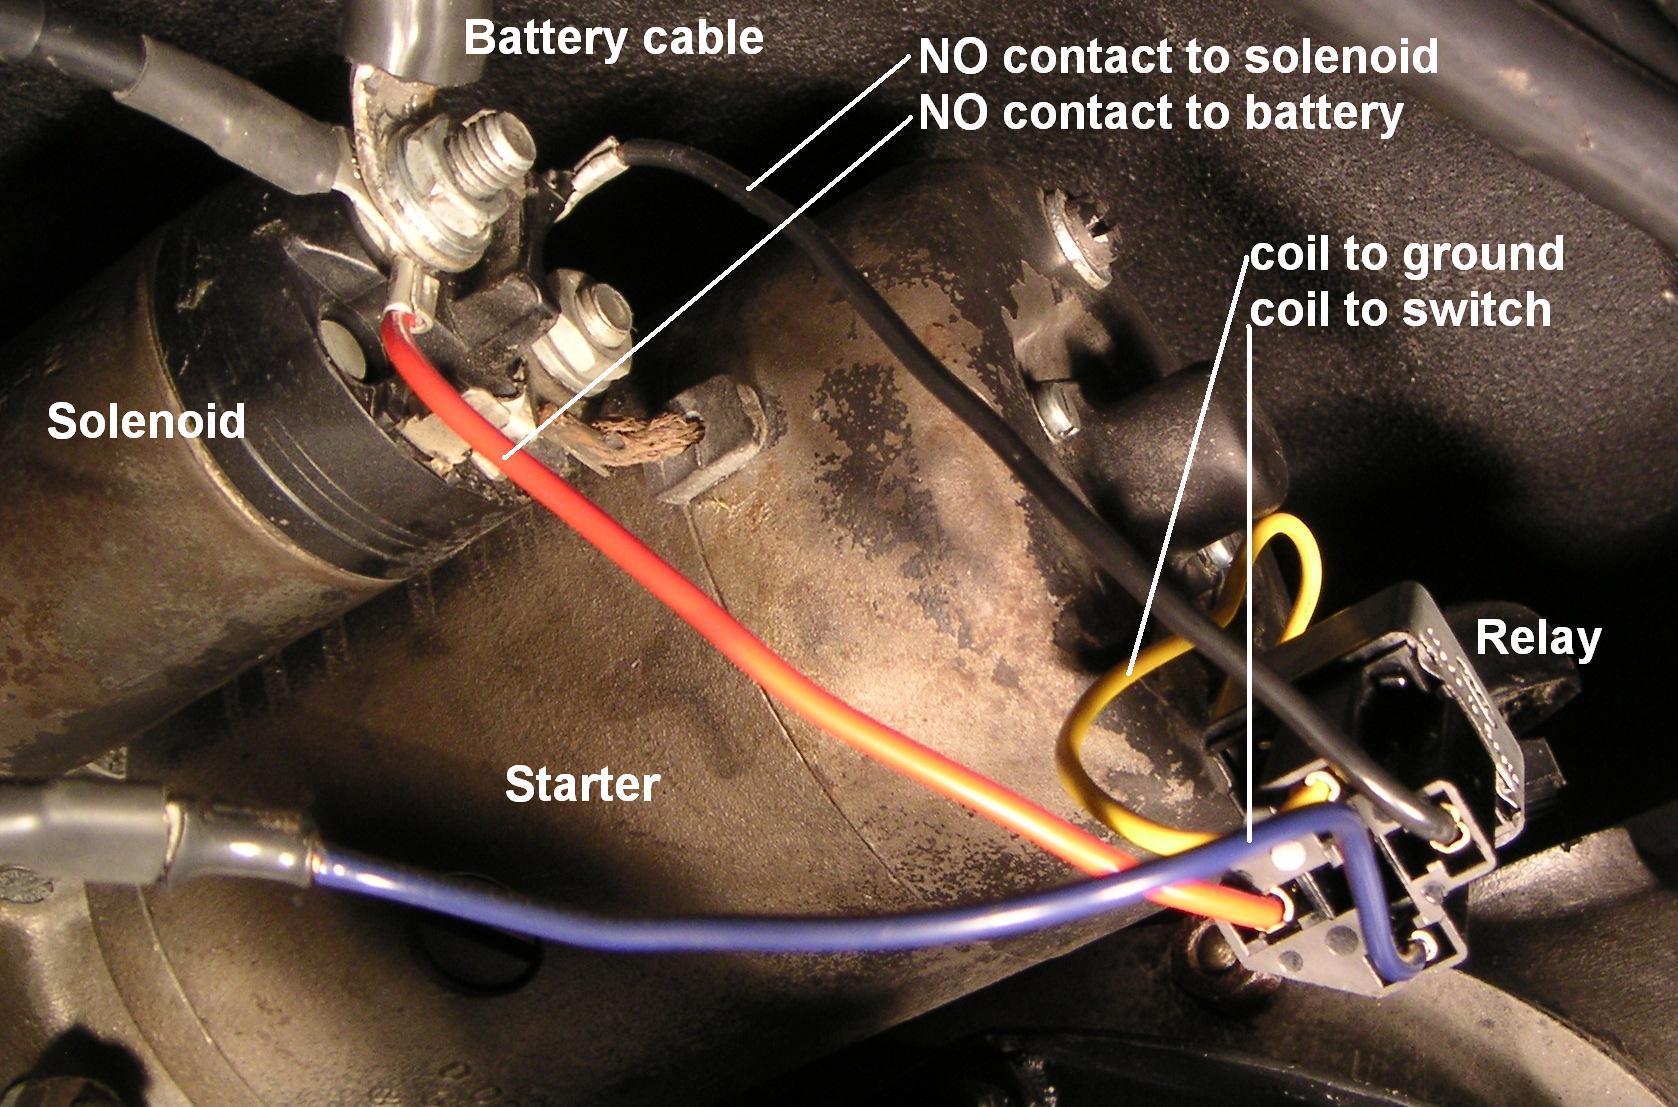 Index Of I 1977 Dodge Sportsman Motorhome Wiring Diagram Starter Solenoid Relay Xdbkhje